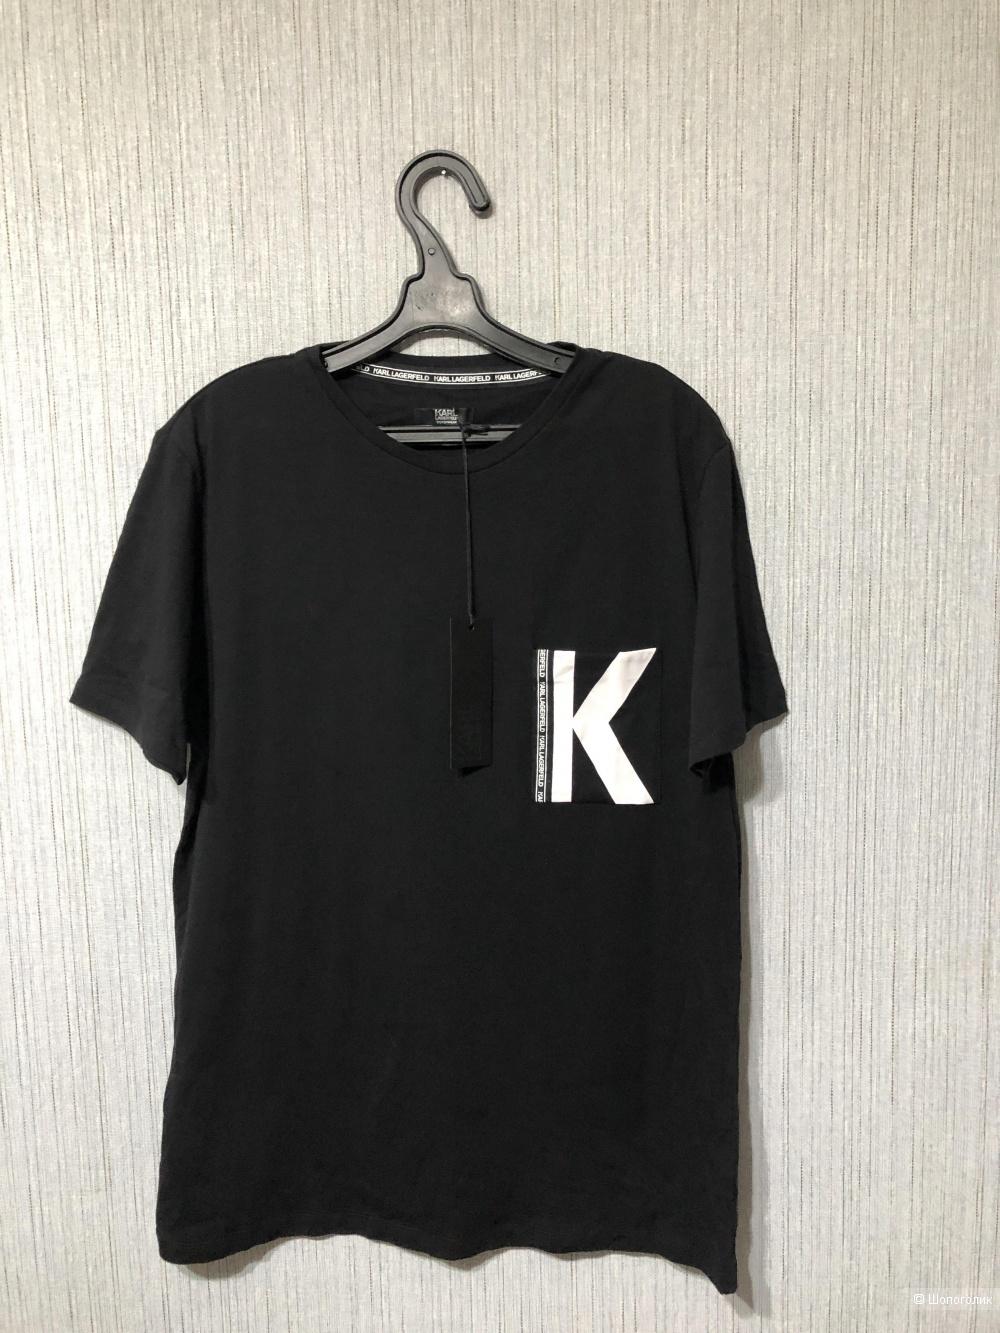 Футболка Karl Lagerfeld размер M/L